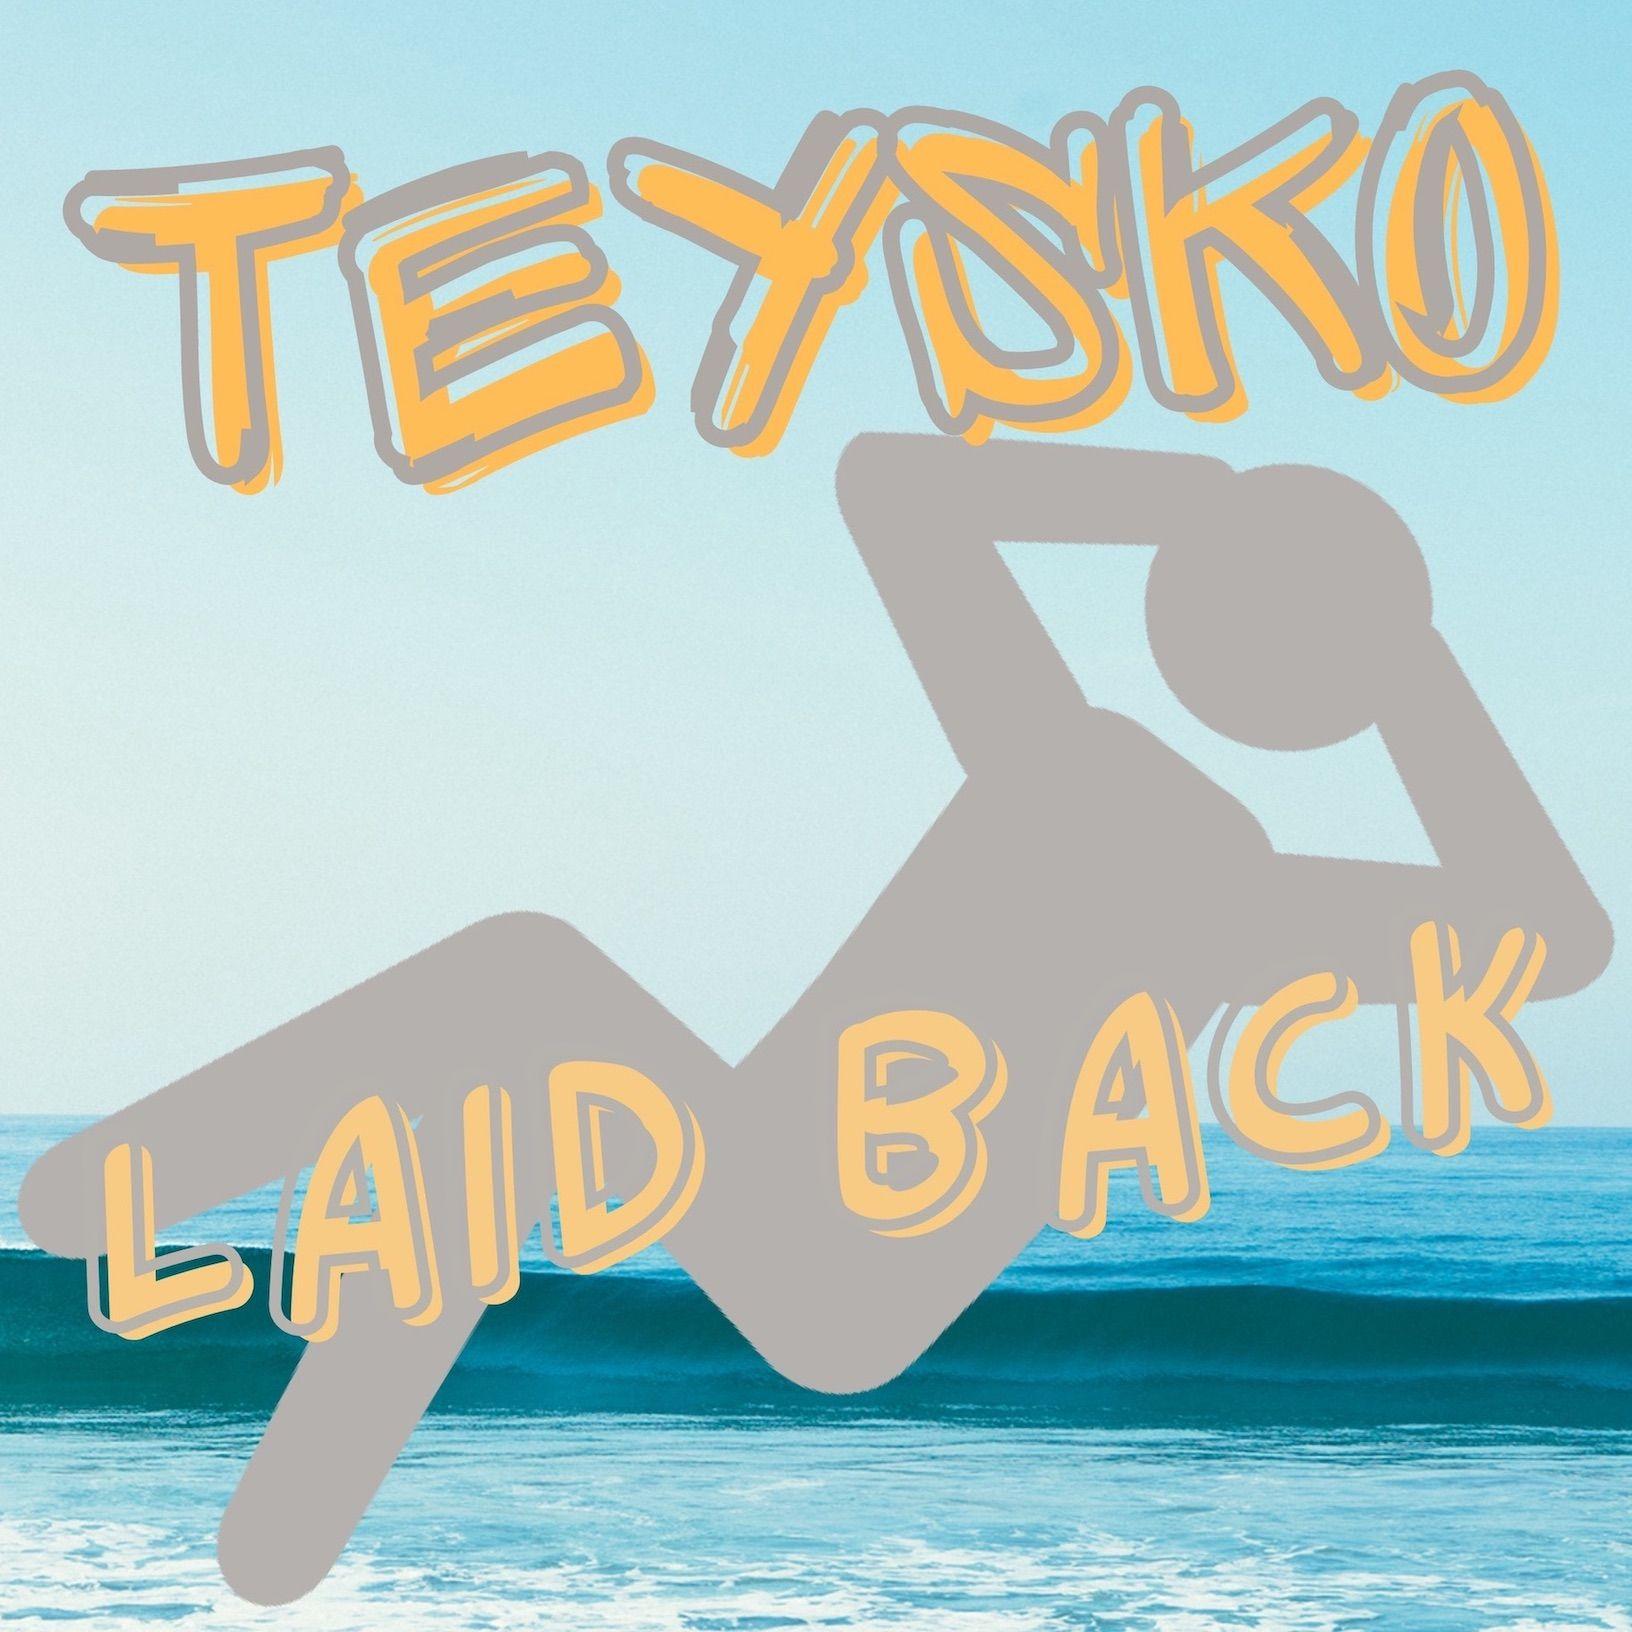 Teysko, Laid Back